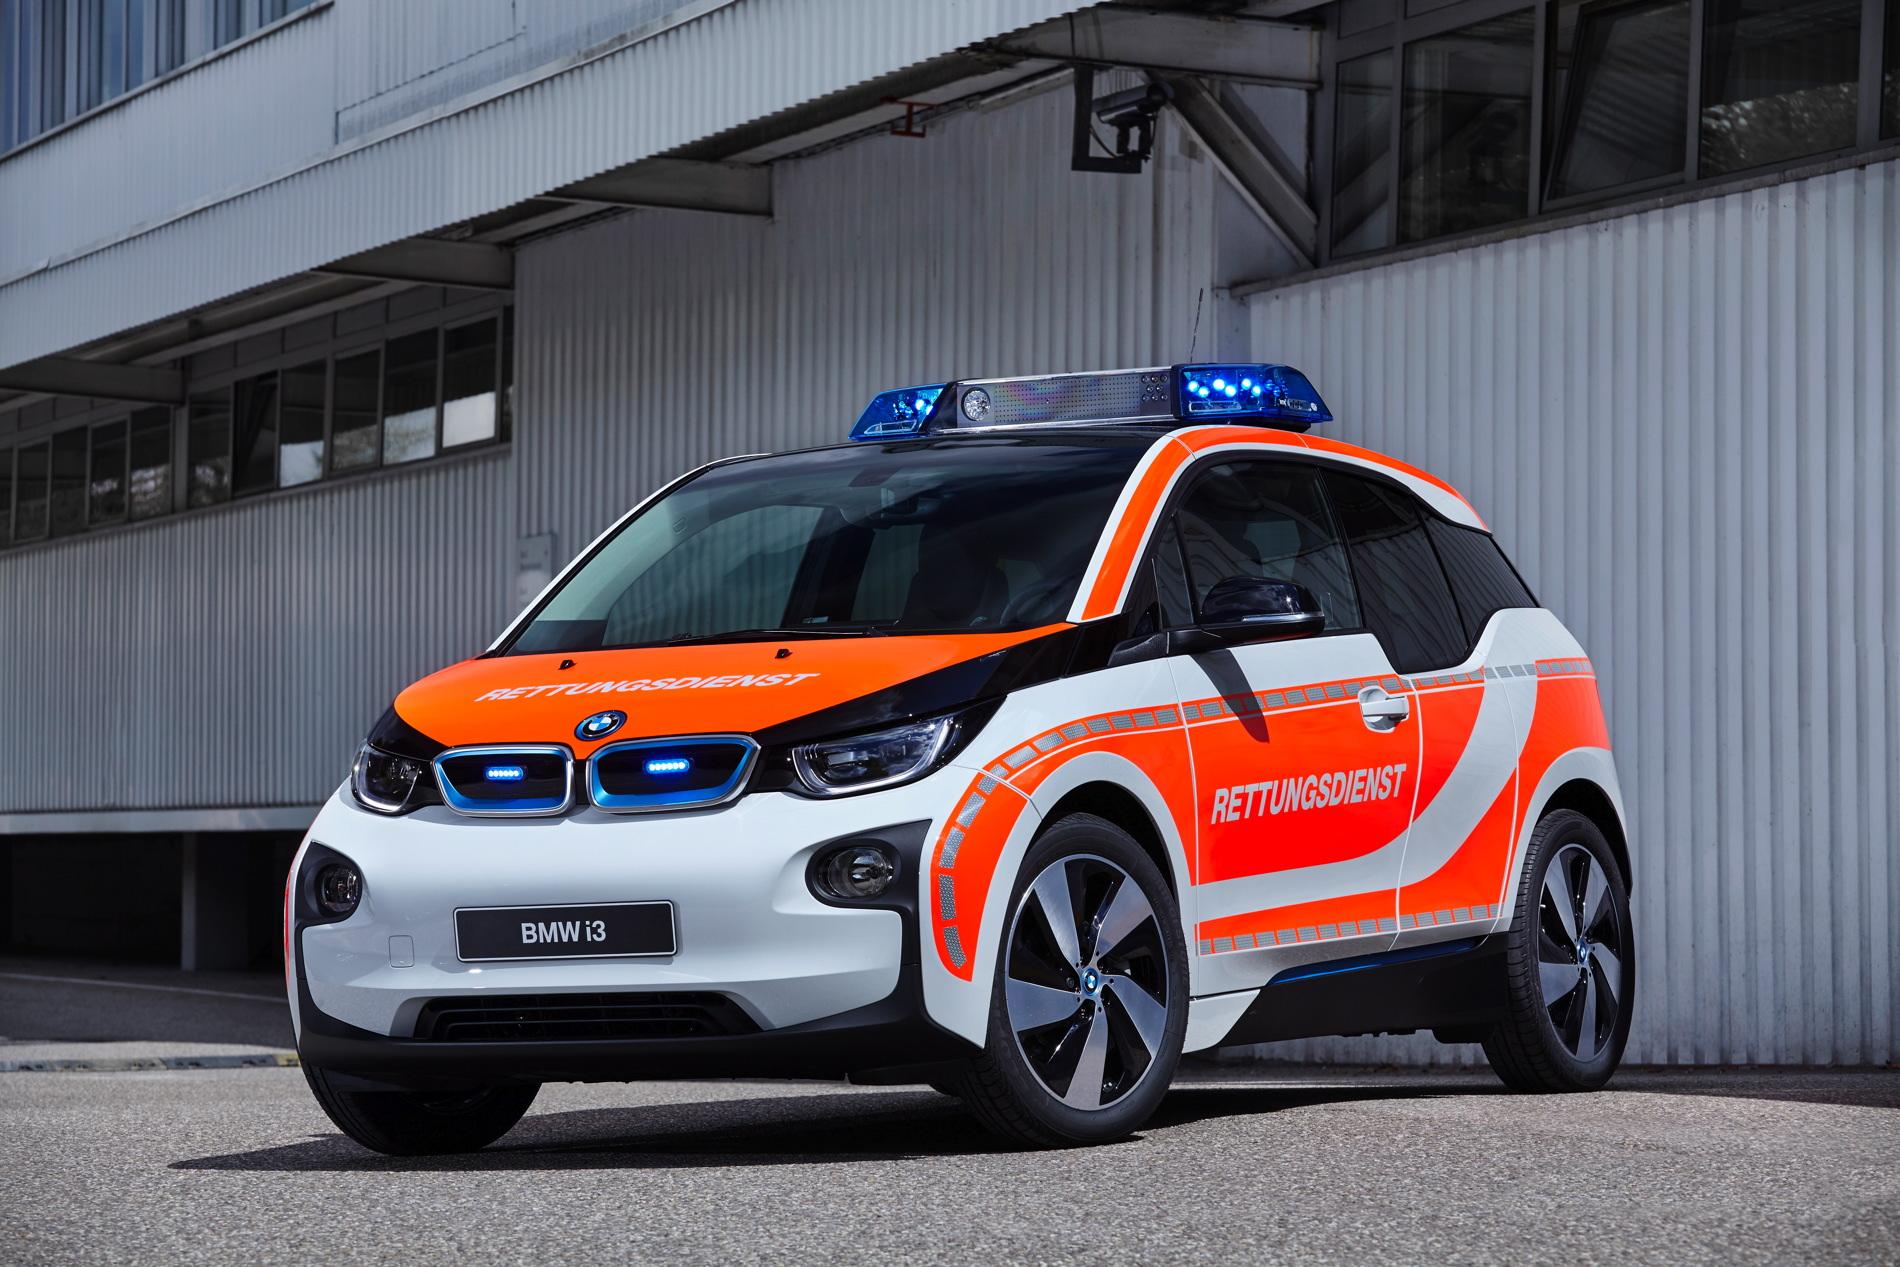 BMW i3 emergency vehicle 2